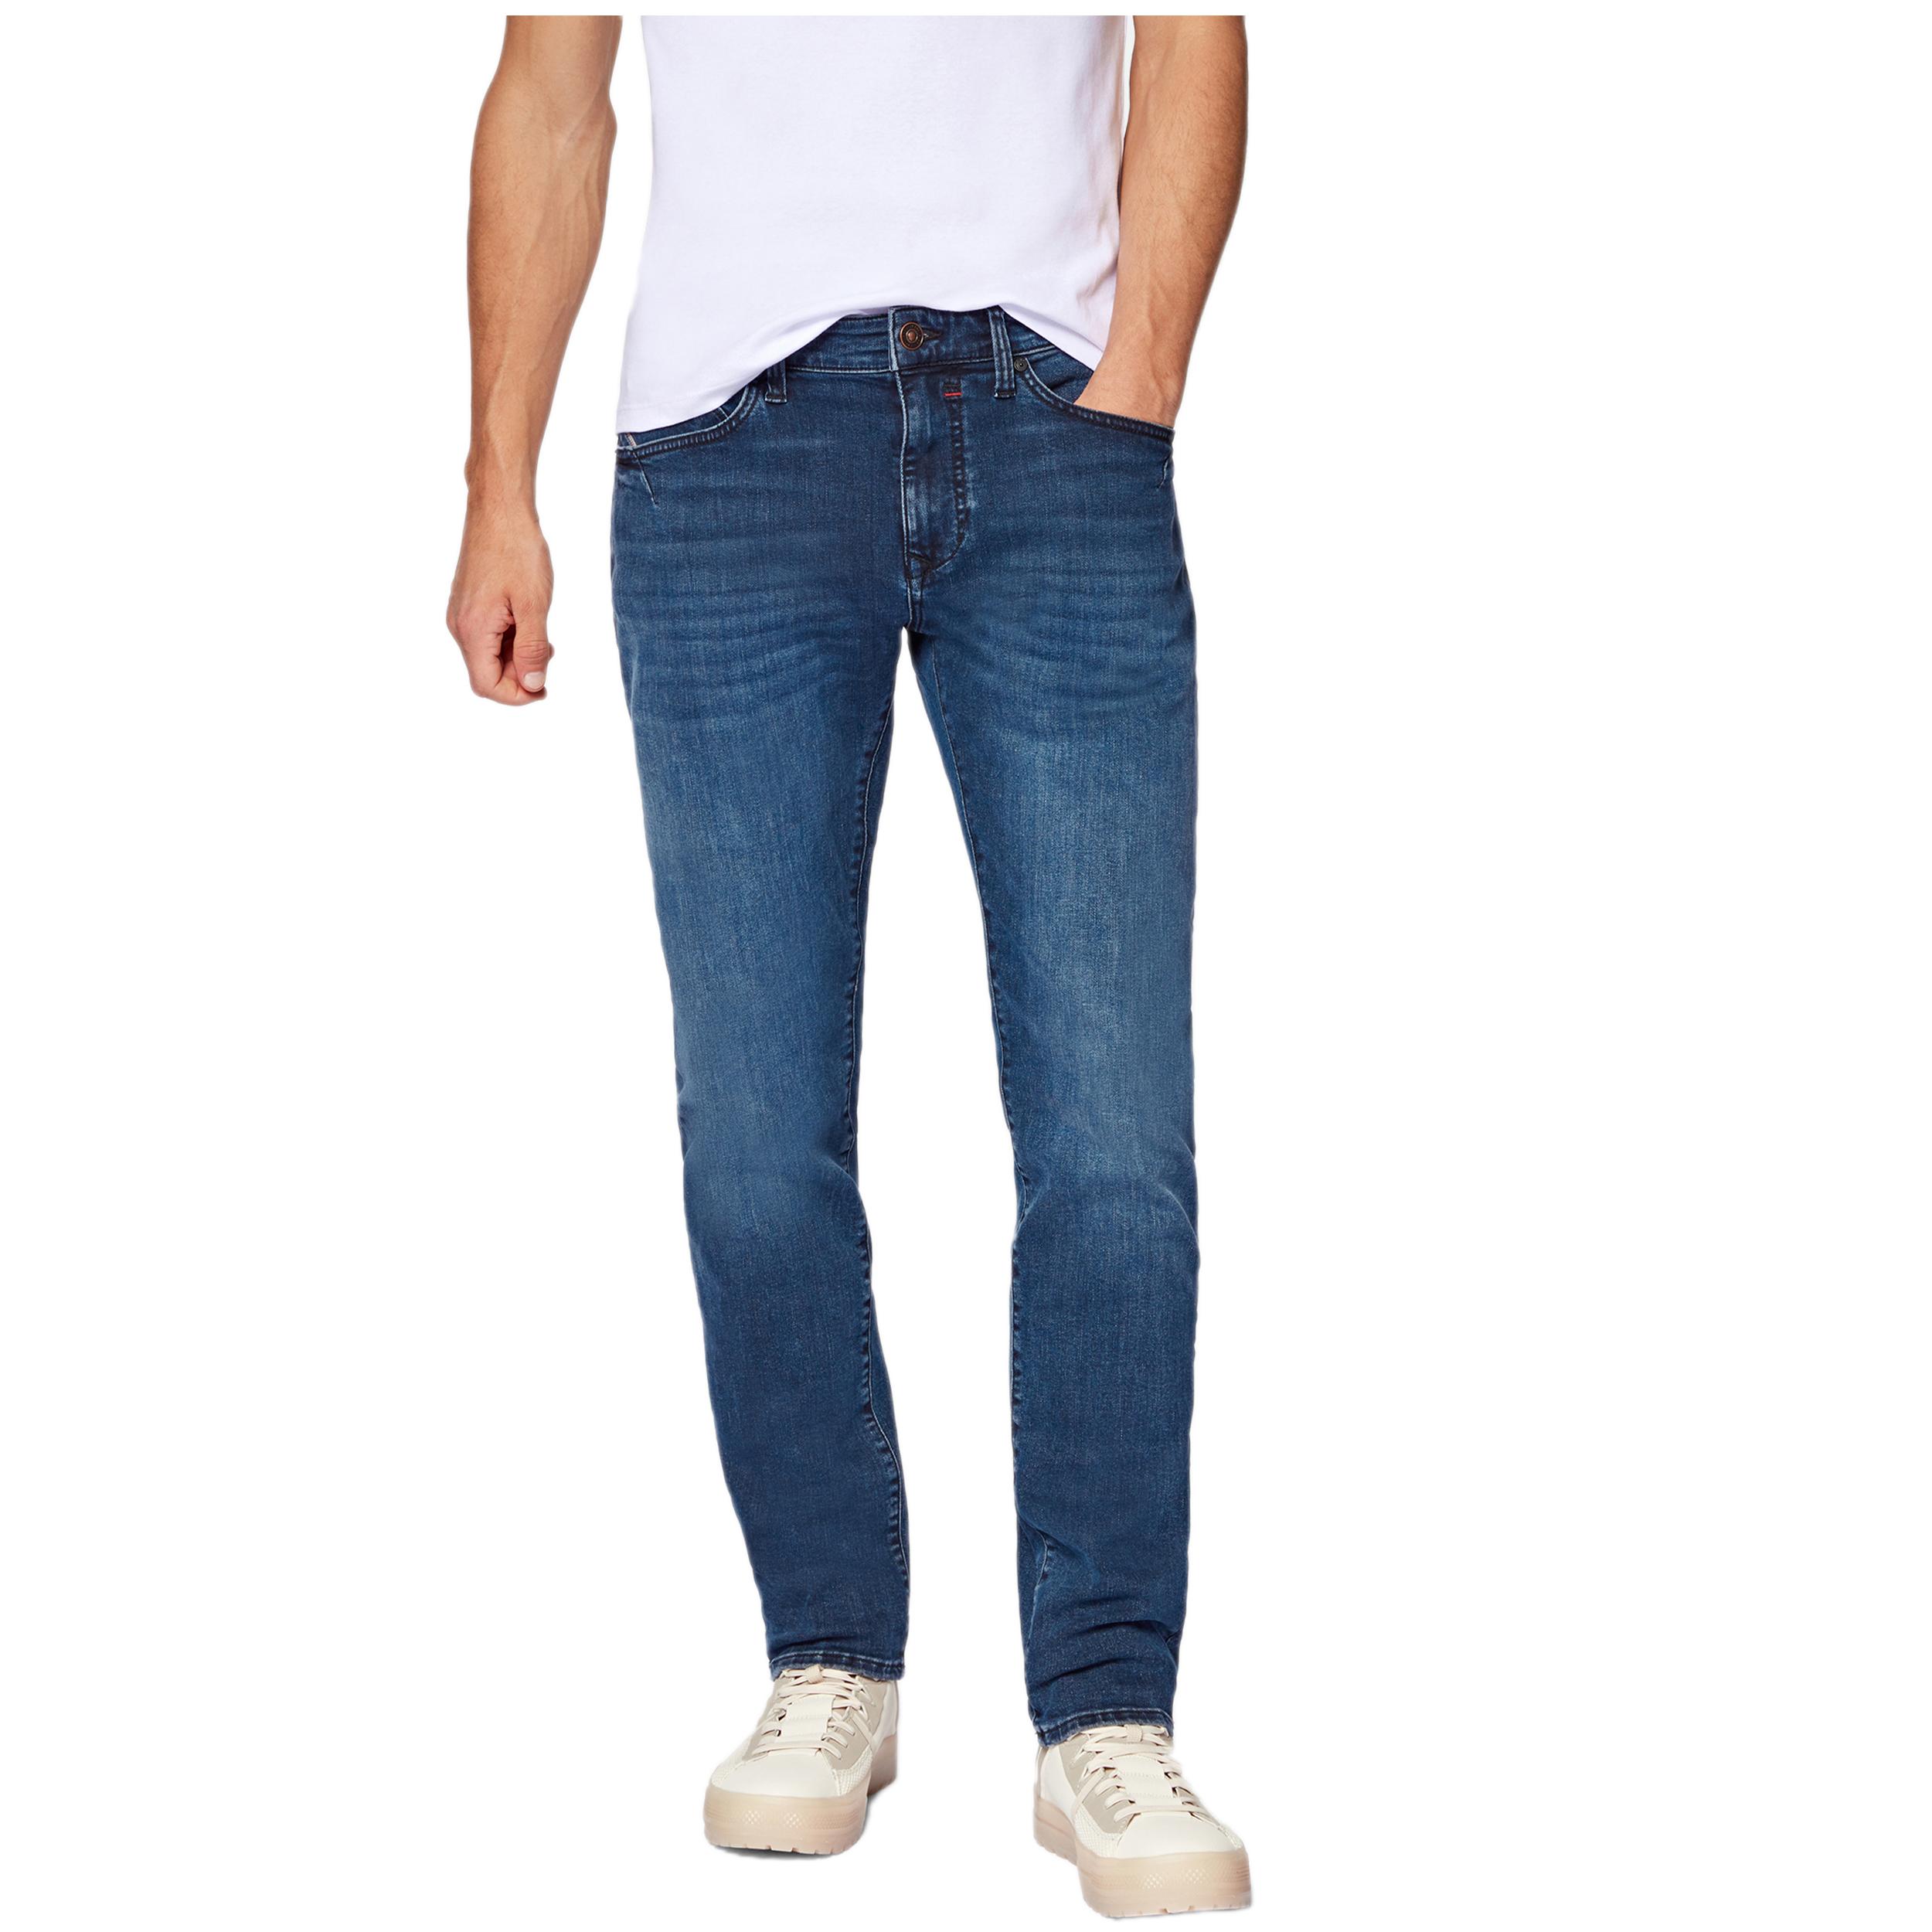 Mavi Herren Jeans Yves ultra move - ink brushed 30/32